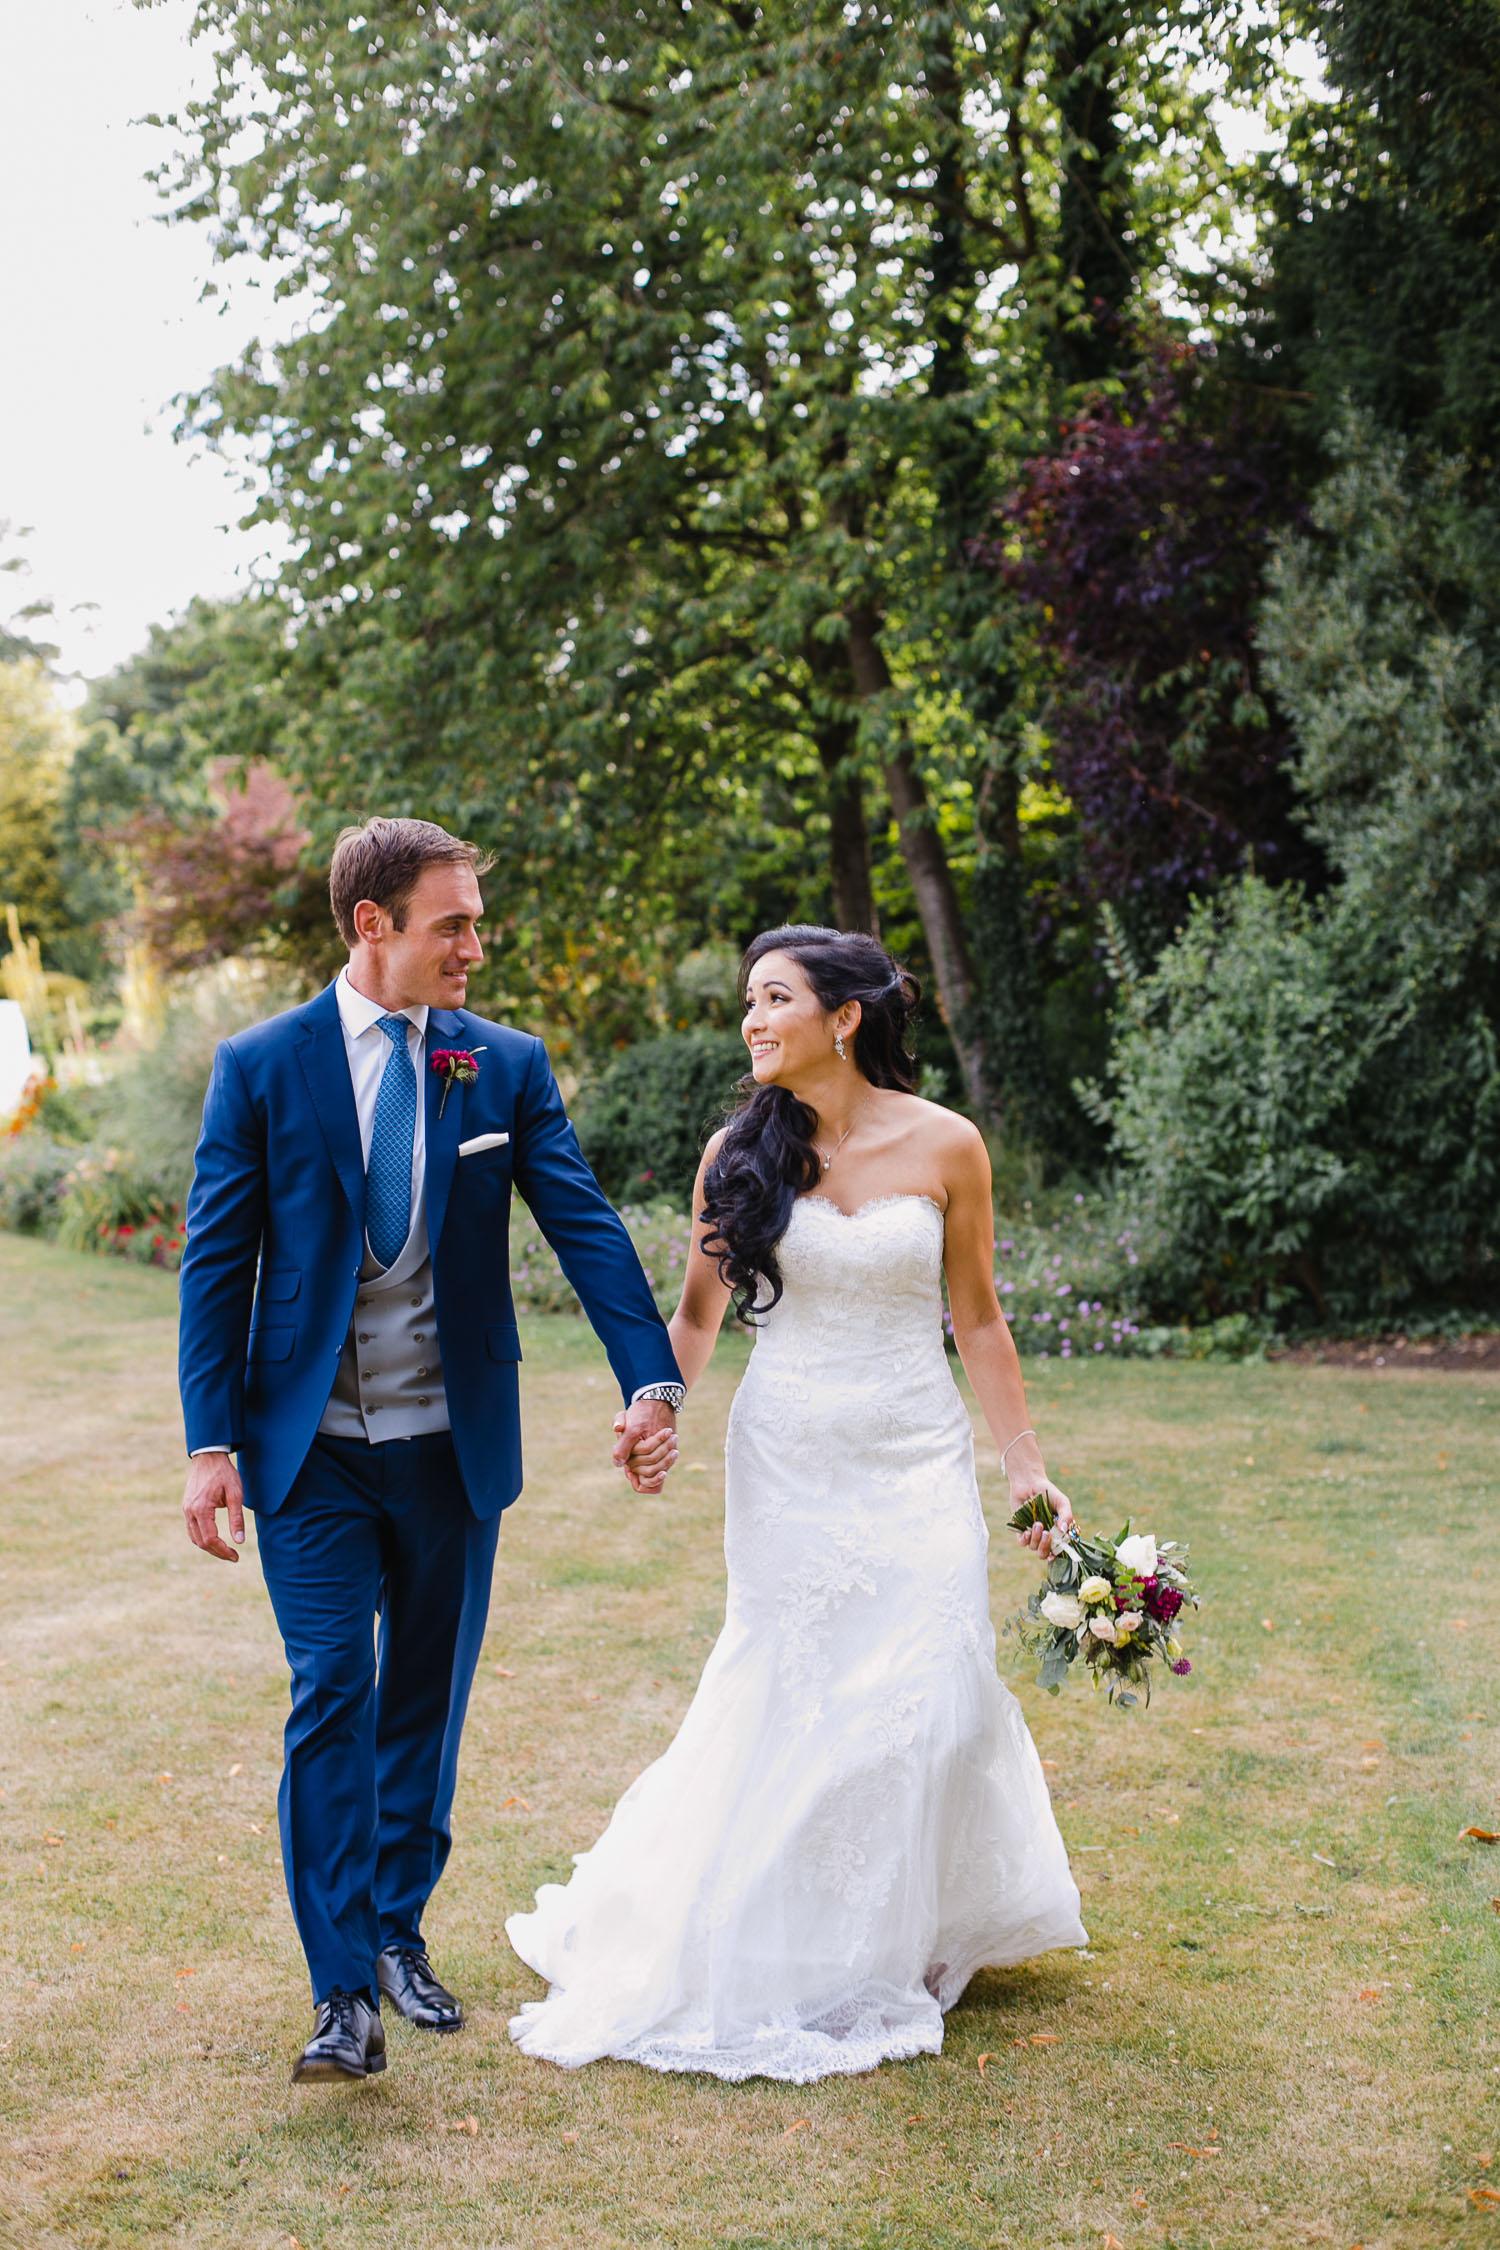 documentary wedding photos at dorney court